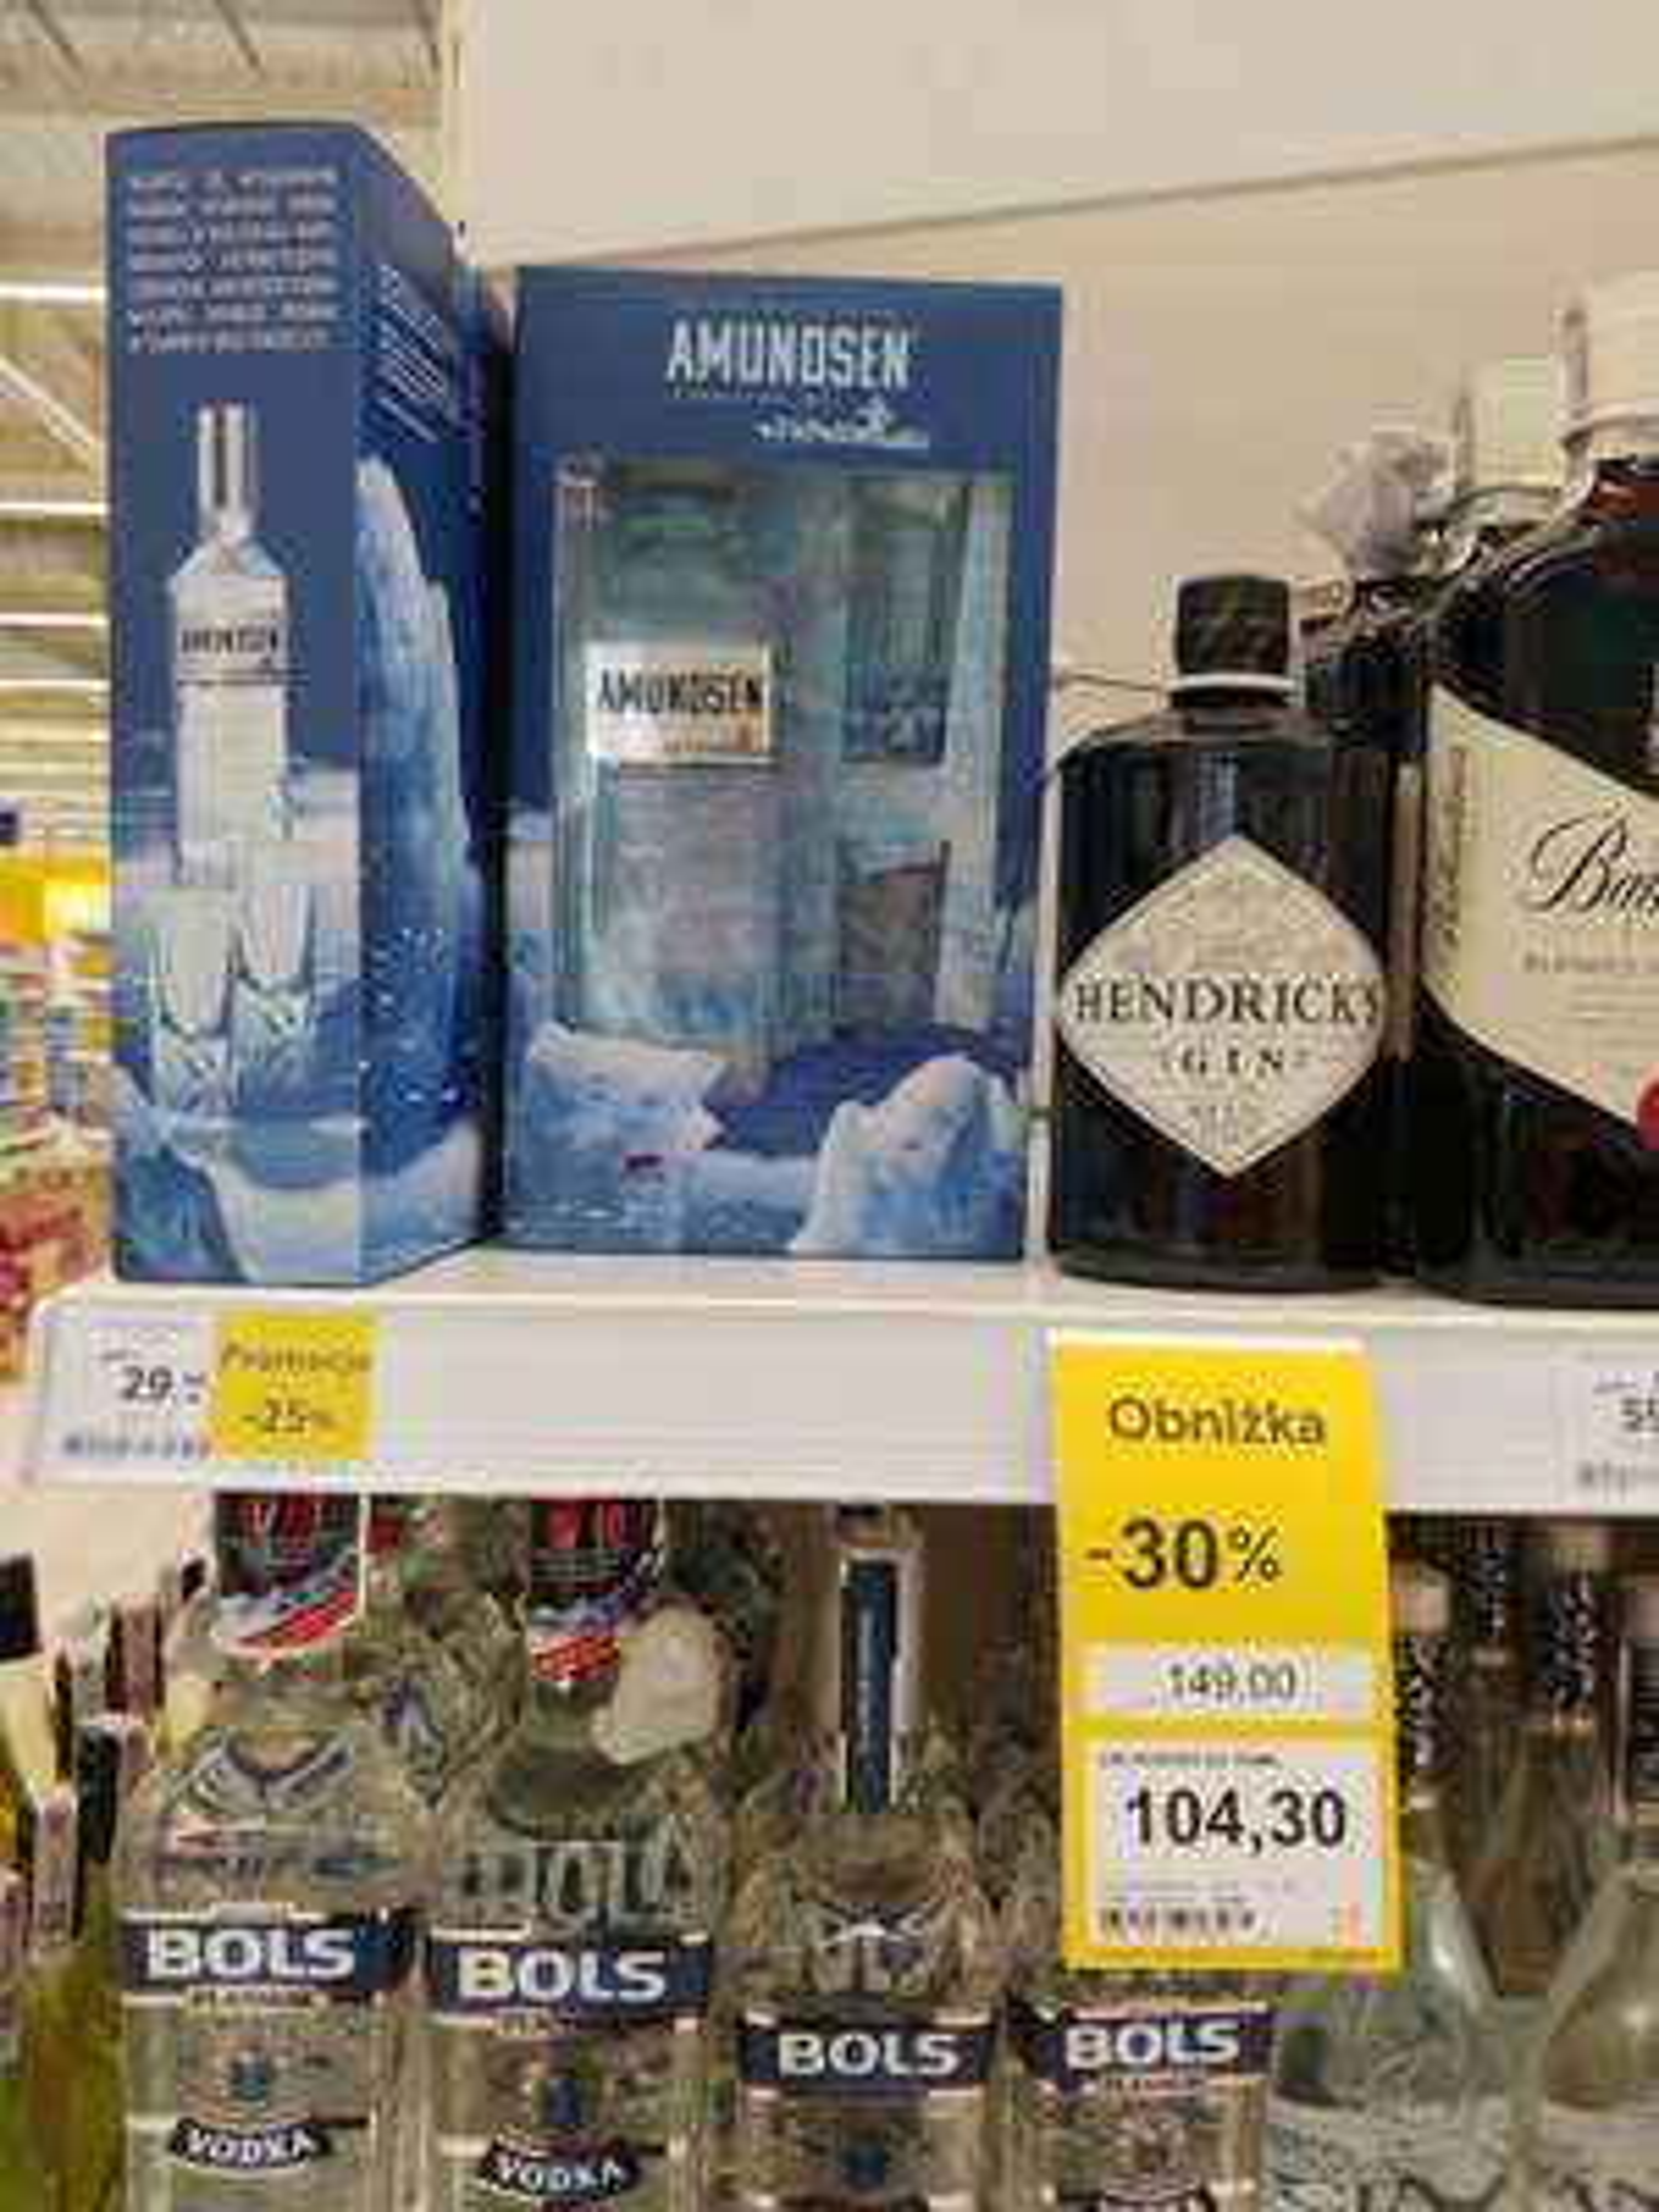 Hendricks Gin 0,7 [Tesco]